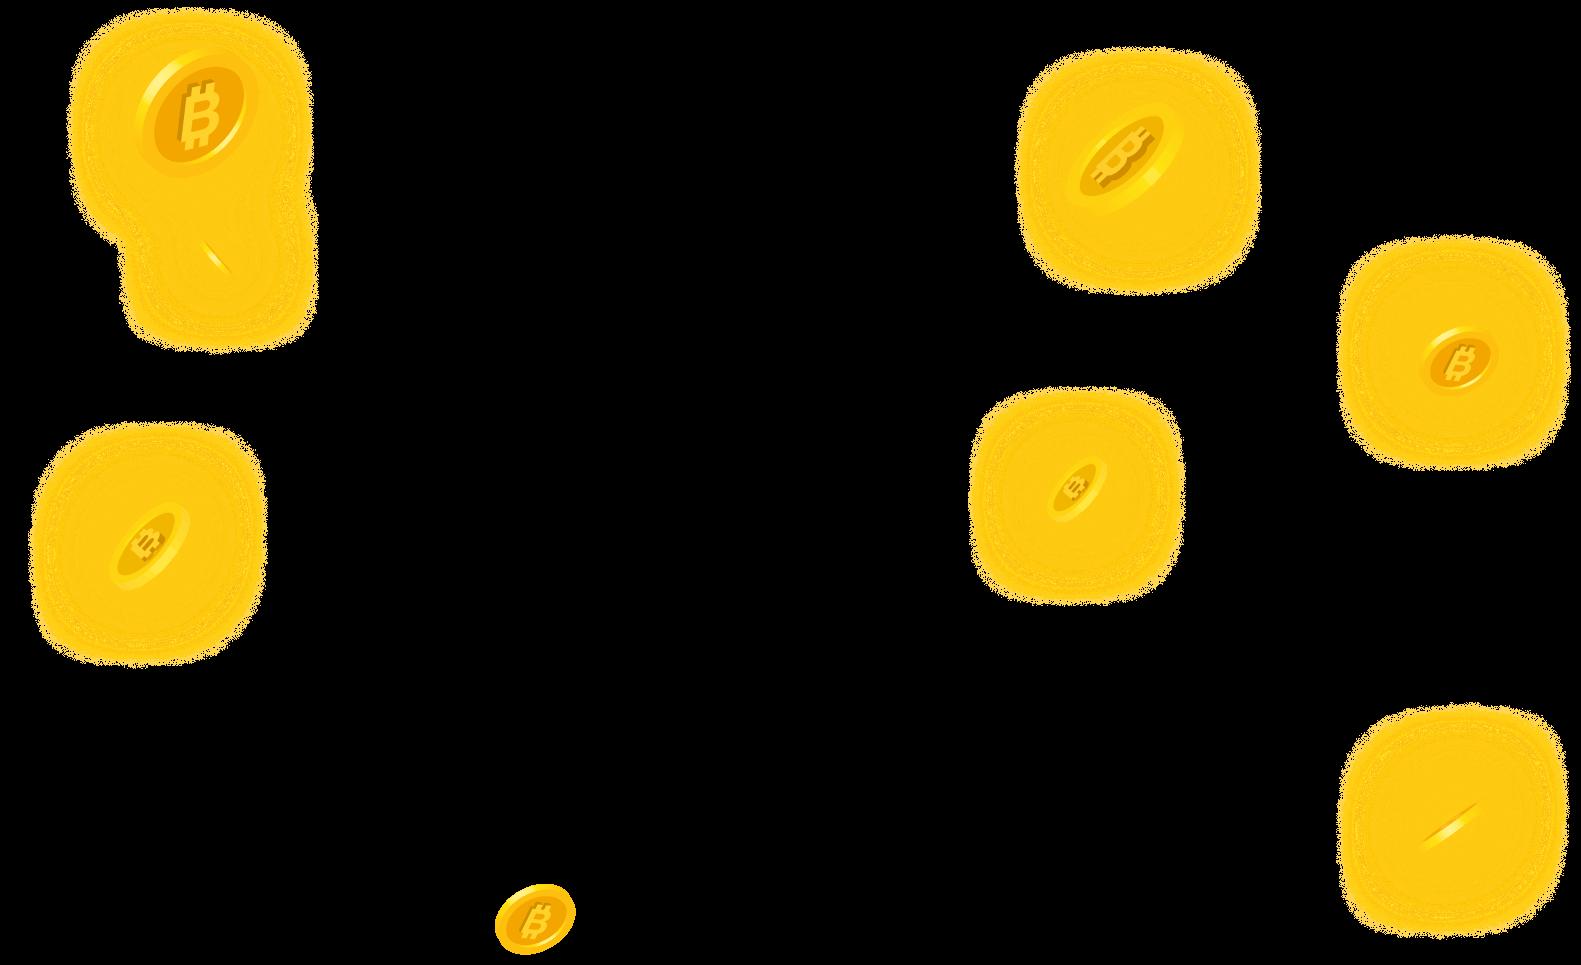 coins elements